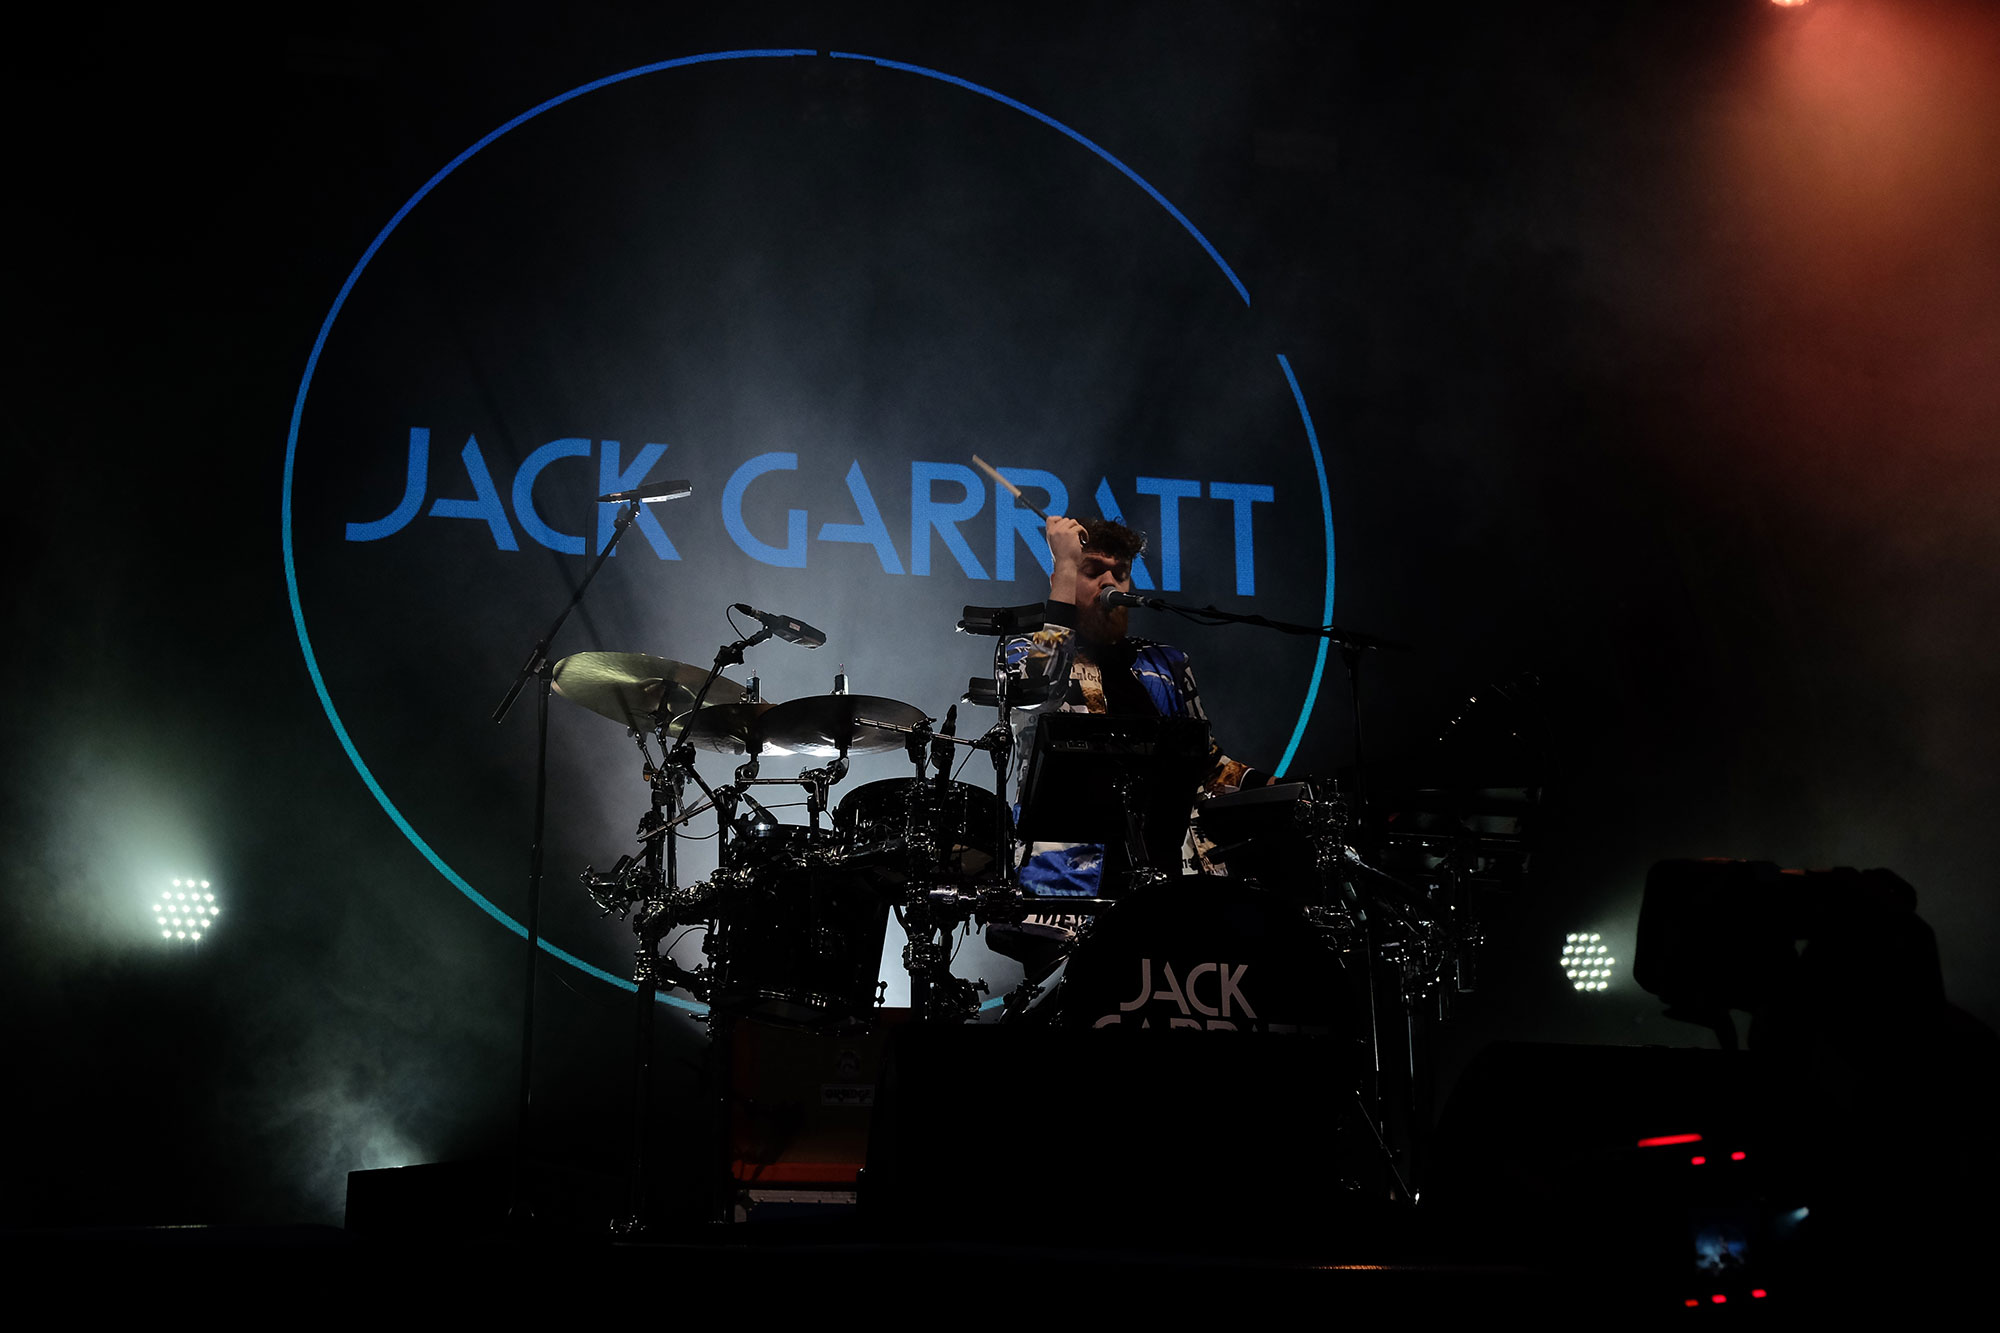 Jack Garratt at Glastonbury Festival, 2016